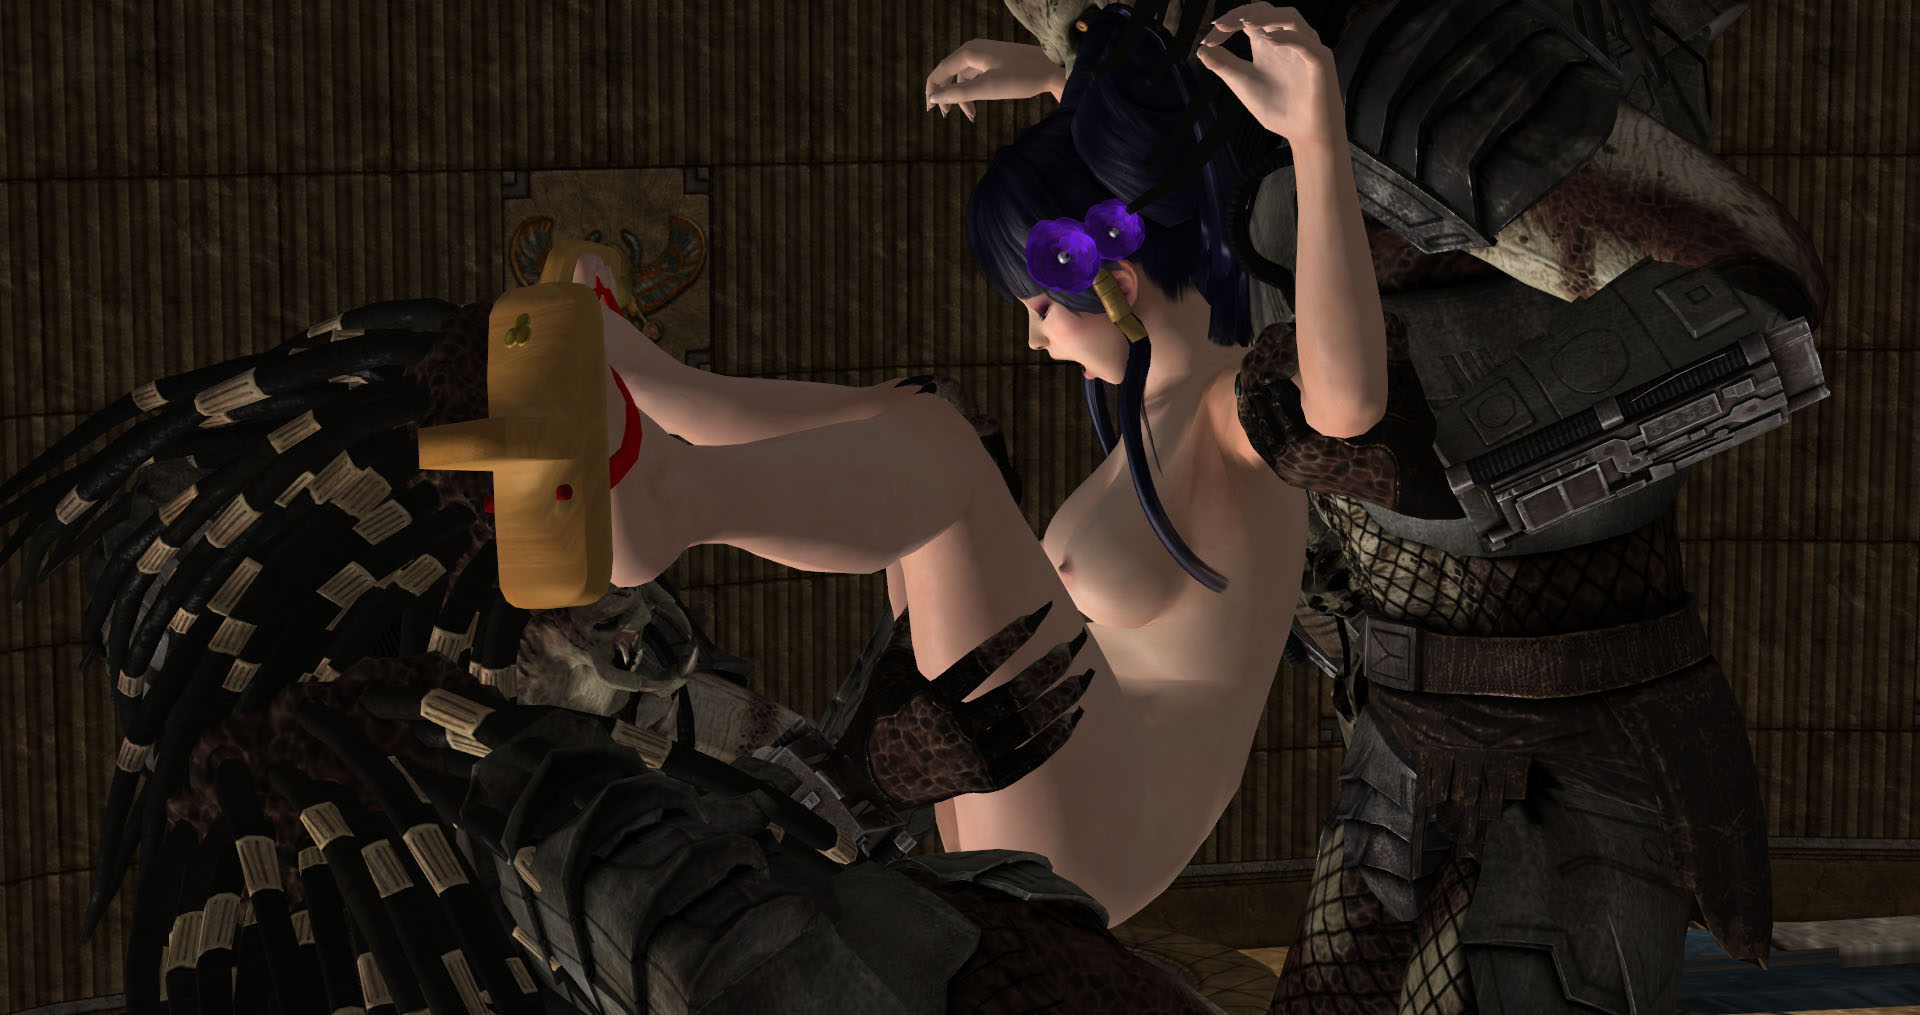 nyotengu_sacrifice_to_pussy_hugger_0024_layer_62_by_bitemonsters-dbgzcmq.jpg